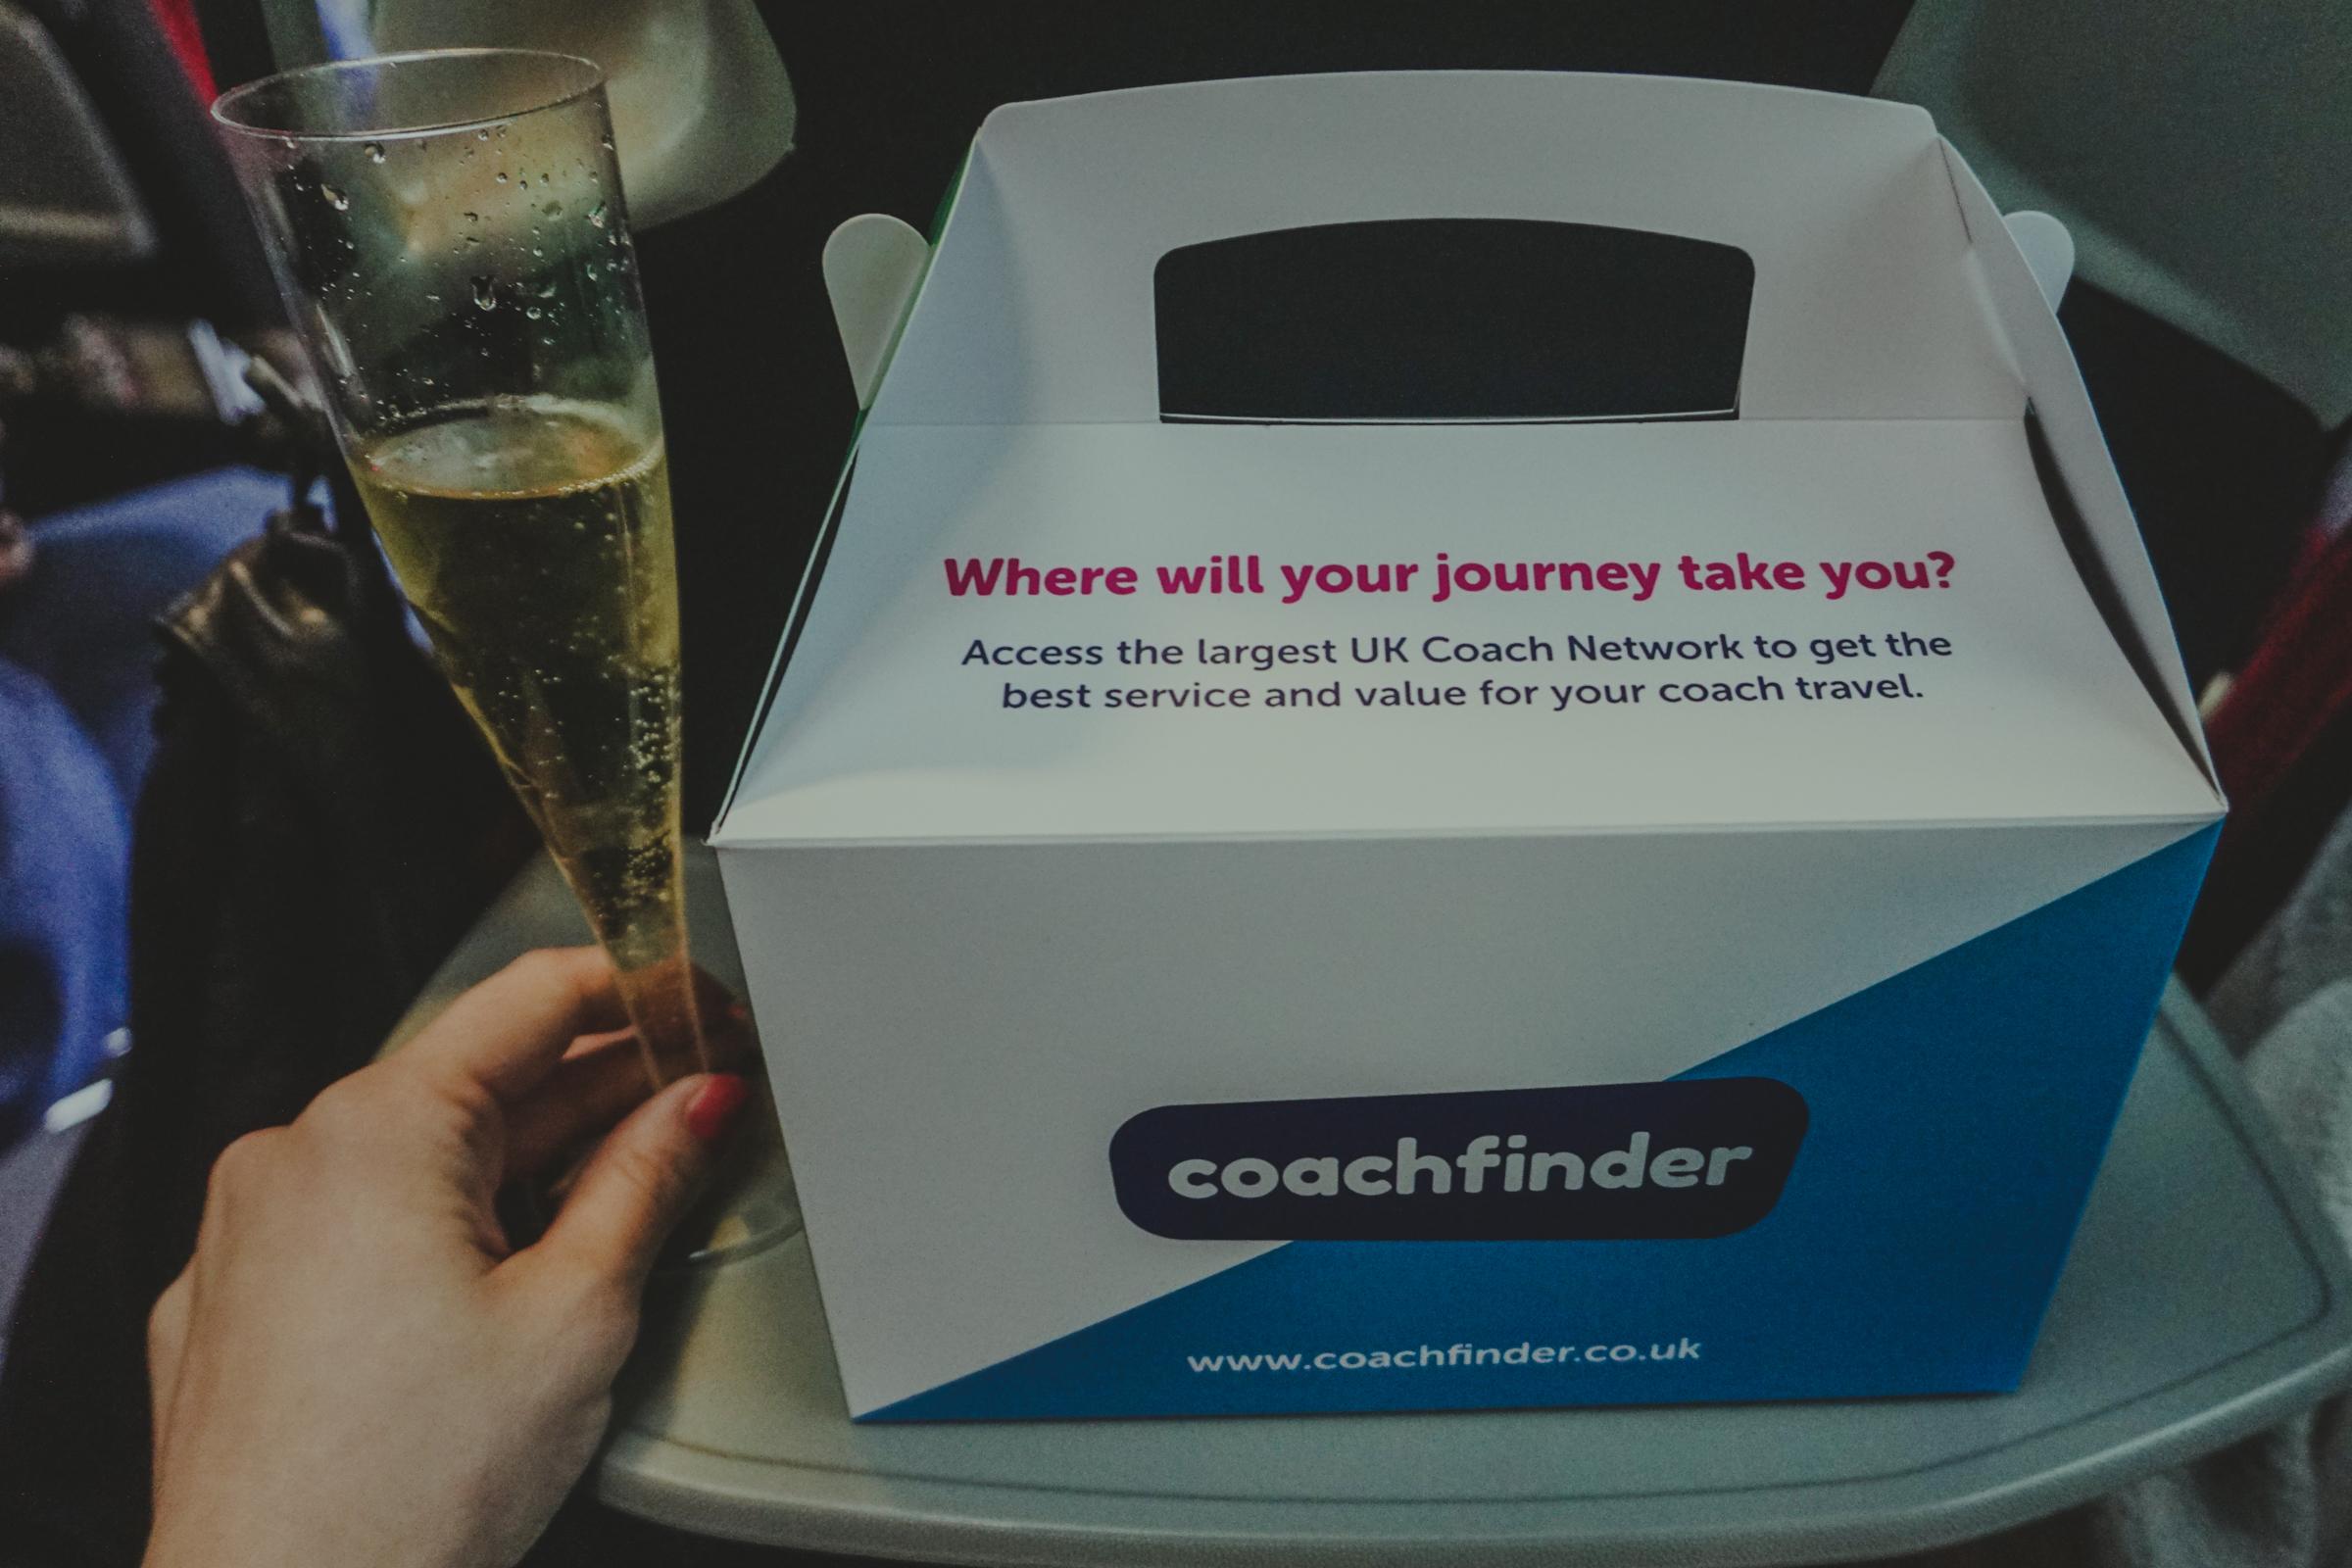 book-a-coach-coachfinder-group-travel-london-uk6.jpg